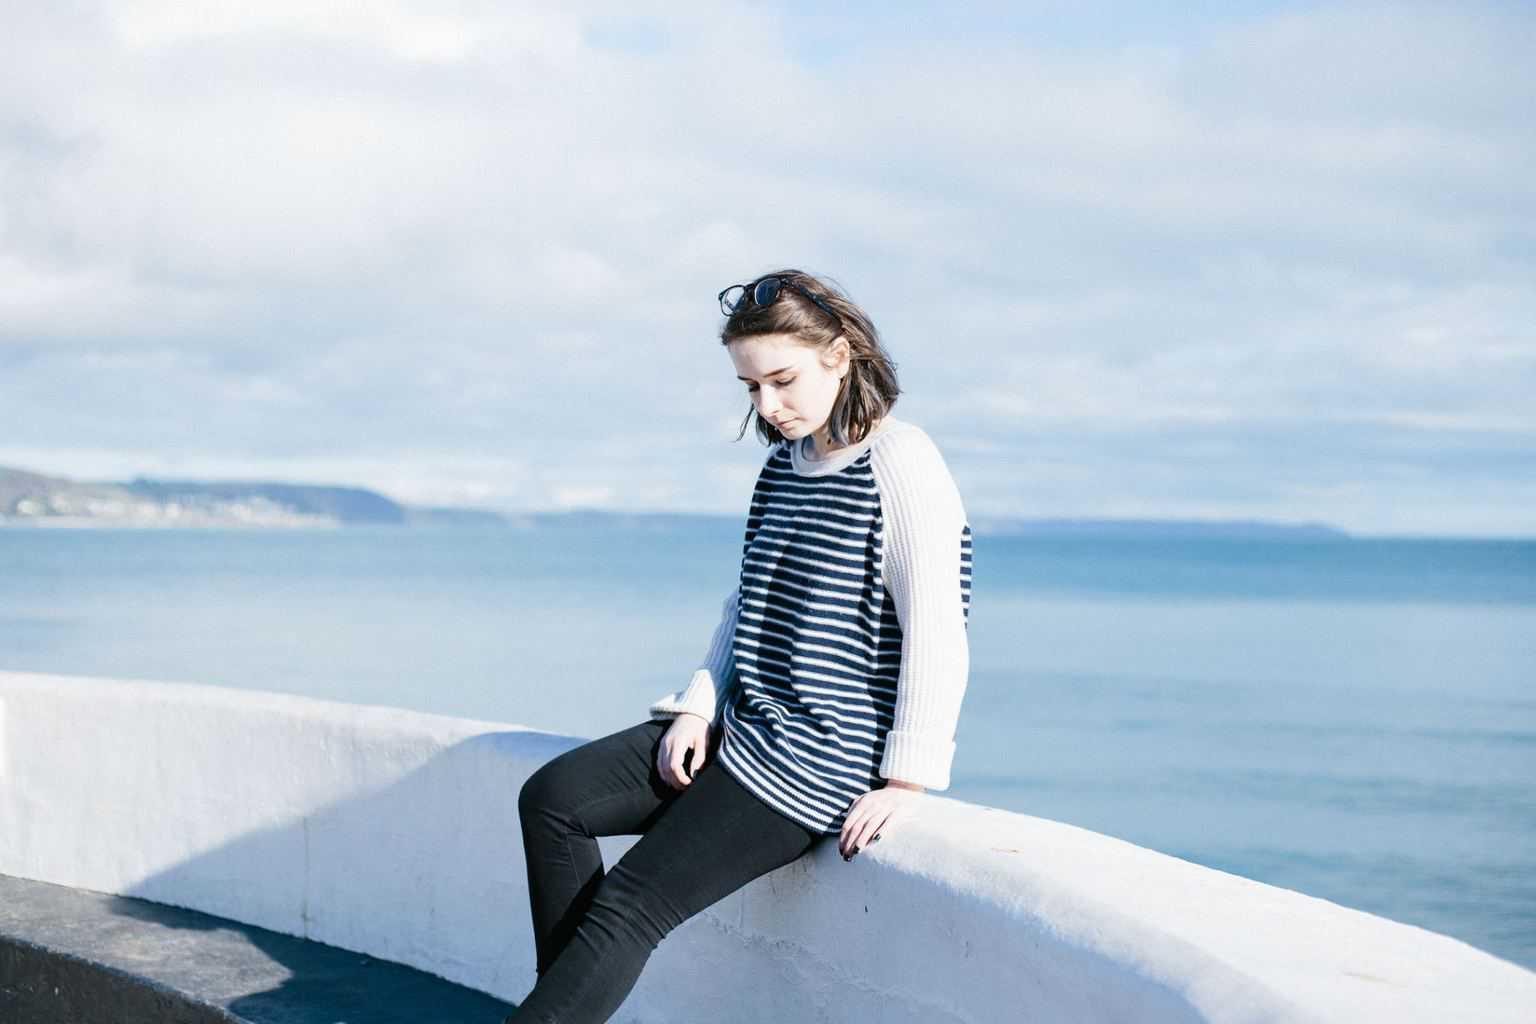 breton stripe jumper